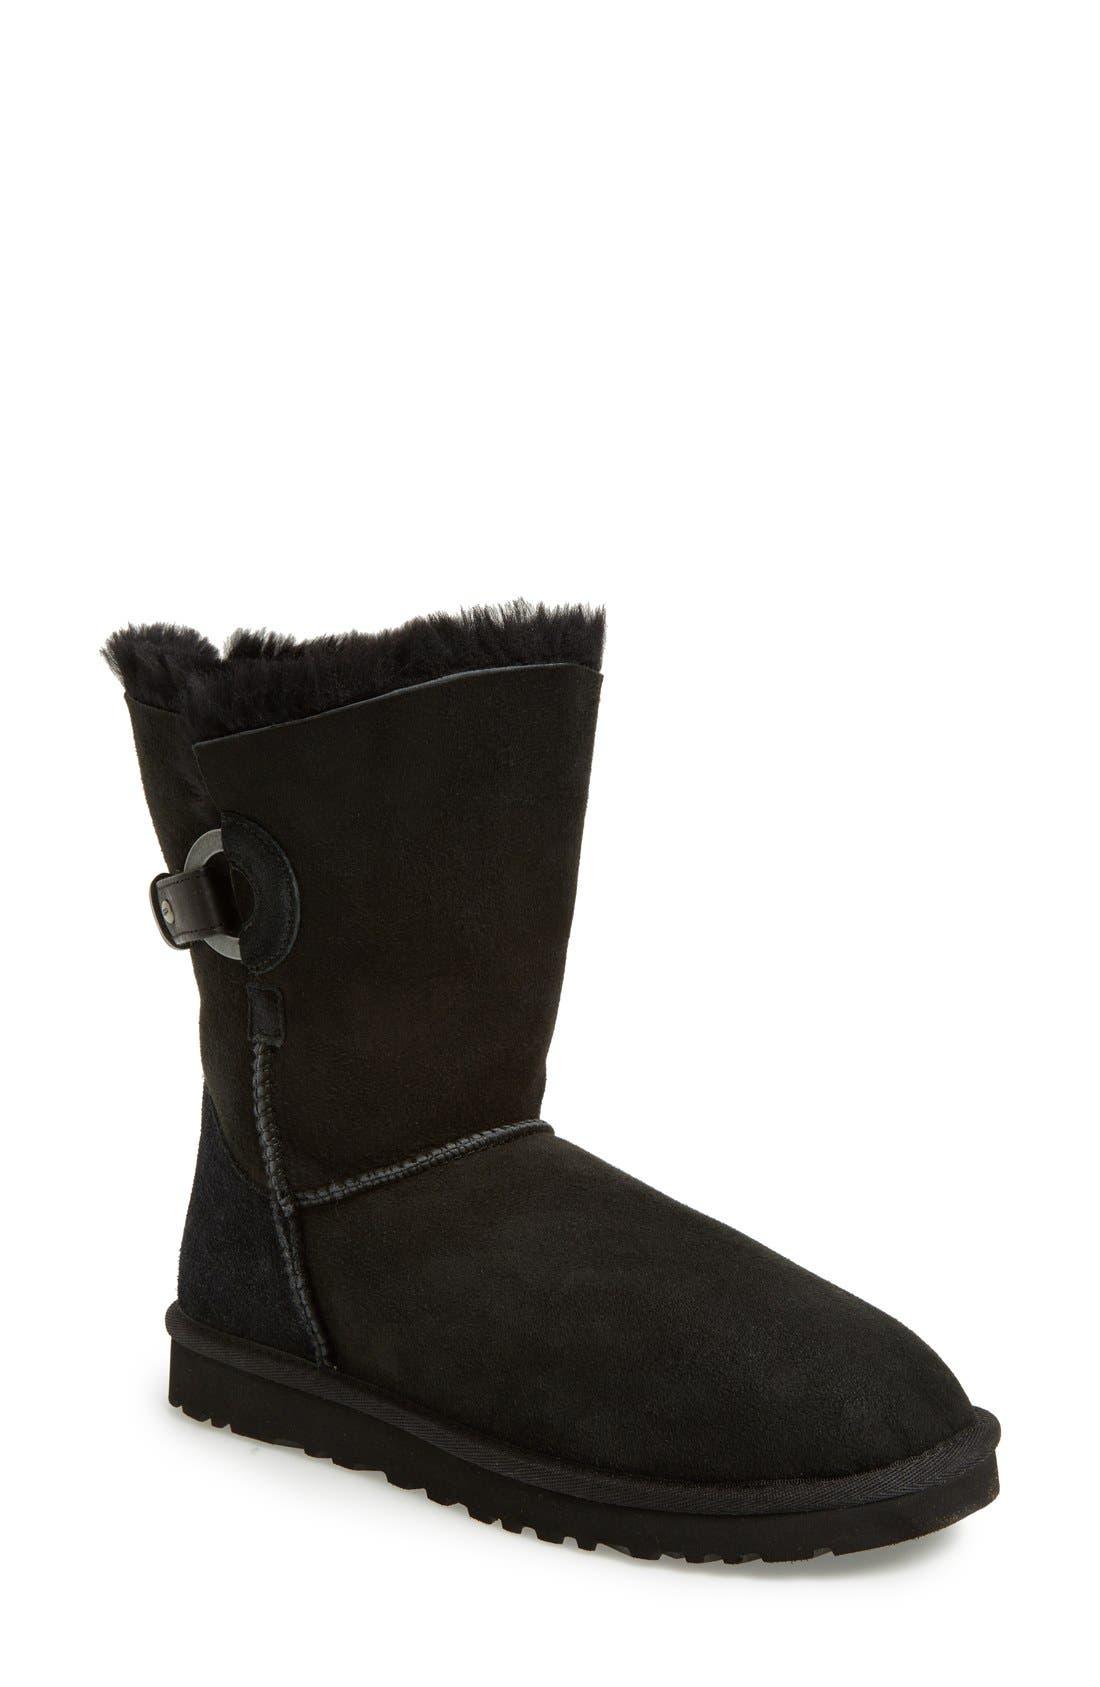 UGG<SUP>®</SUP> Nash Genuine Shearling Boot, Main, color, 001